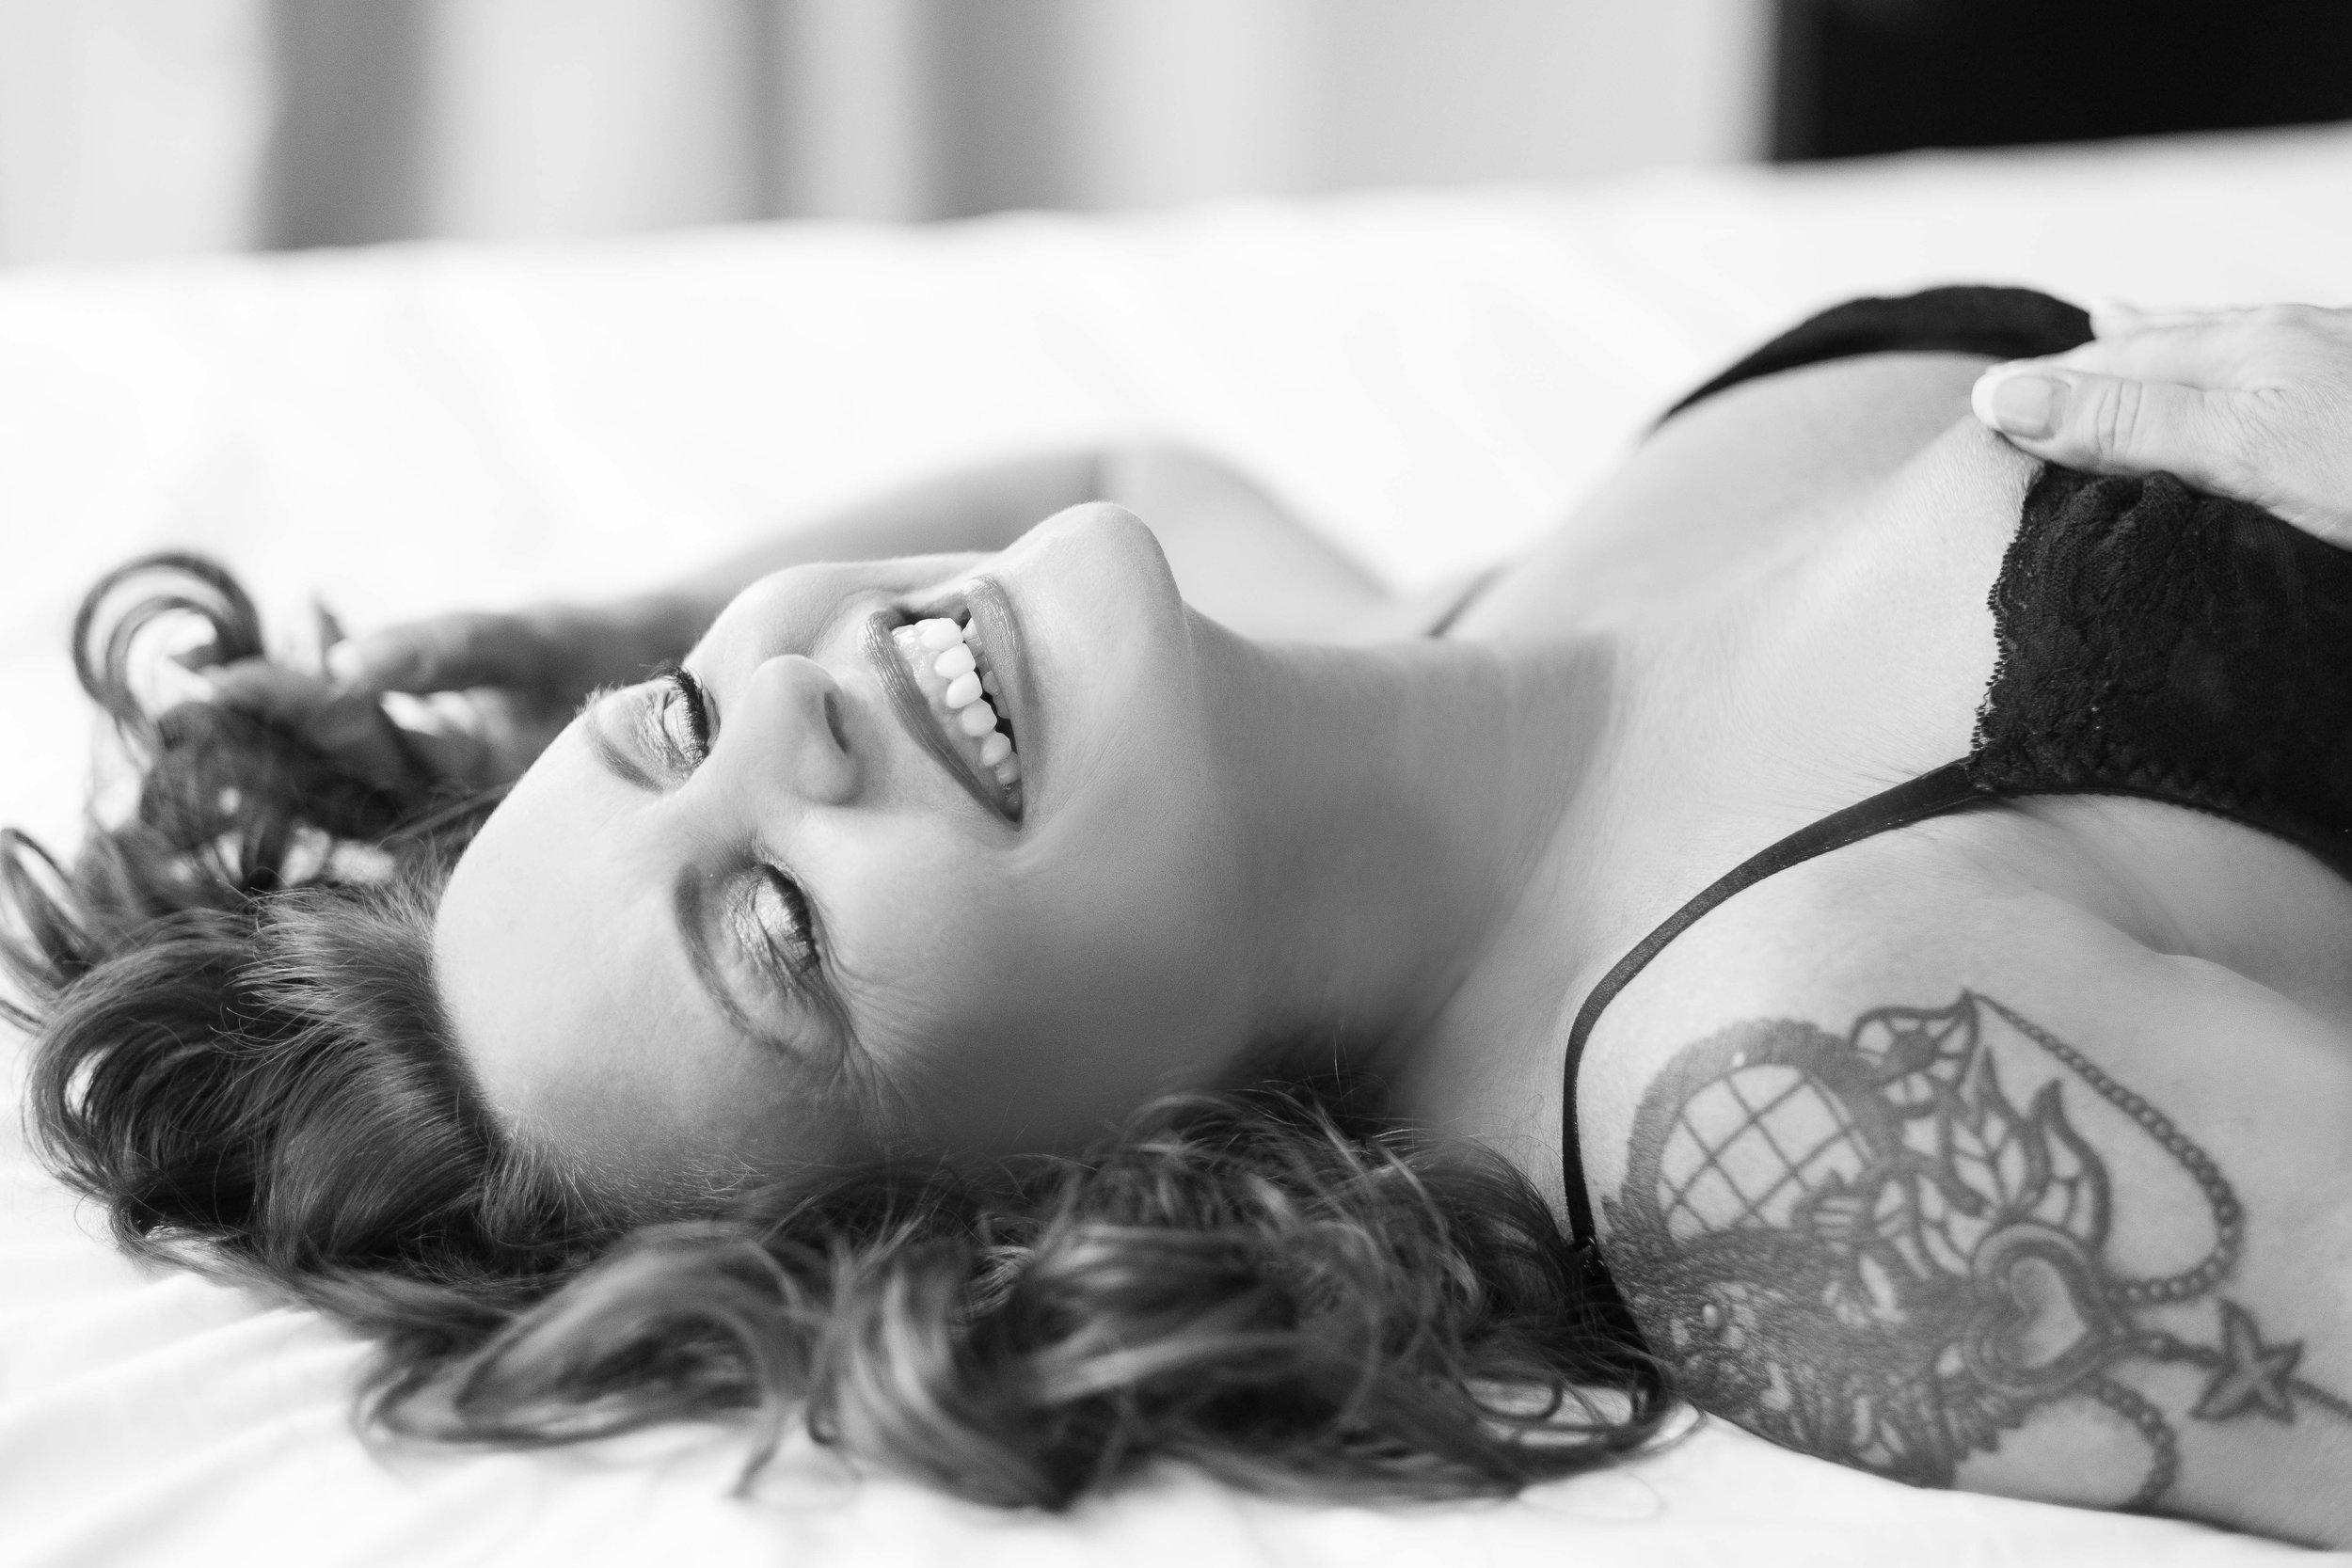 boudoir  fotograaf zwolle boudoir marathon boudoir sessies, sexy, sensueel, vrouwelijk